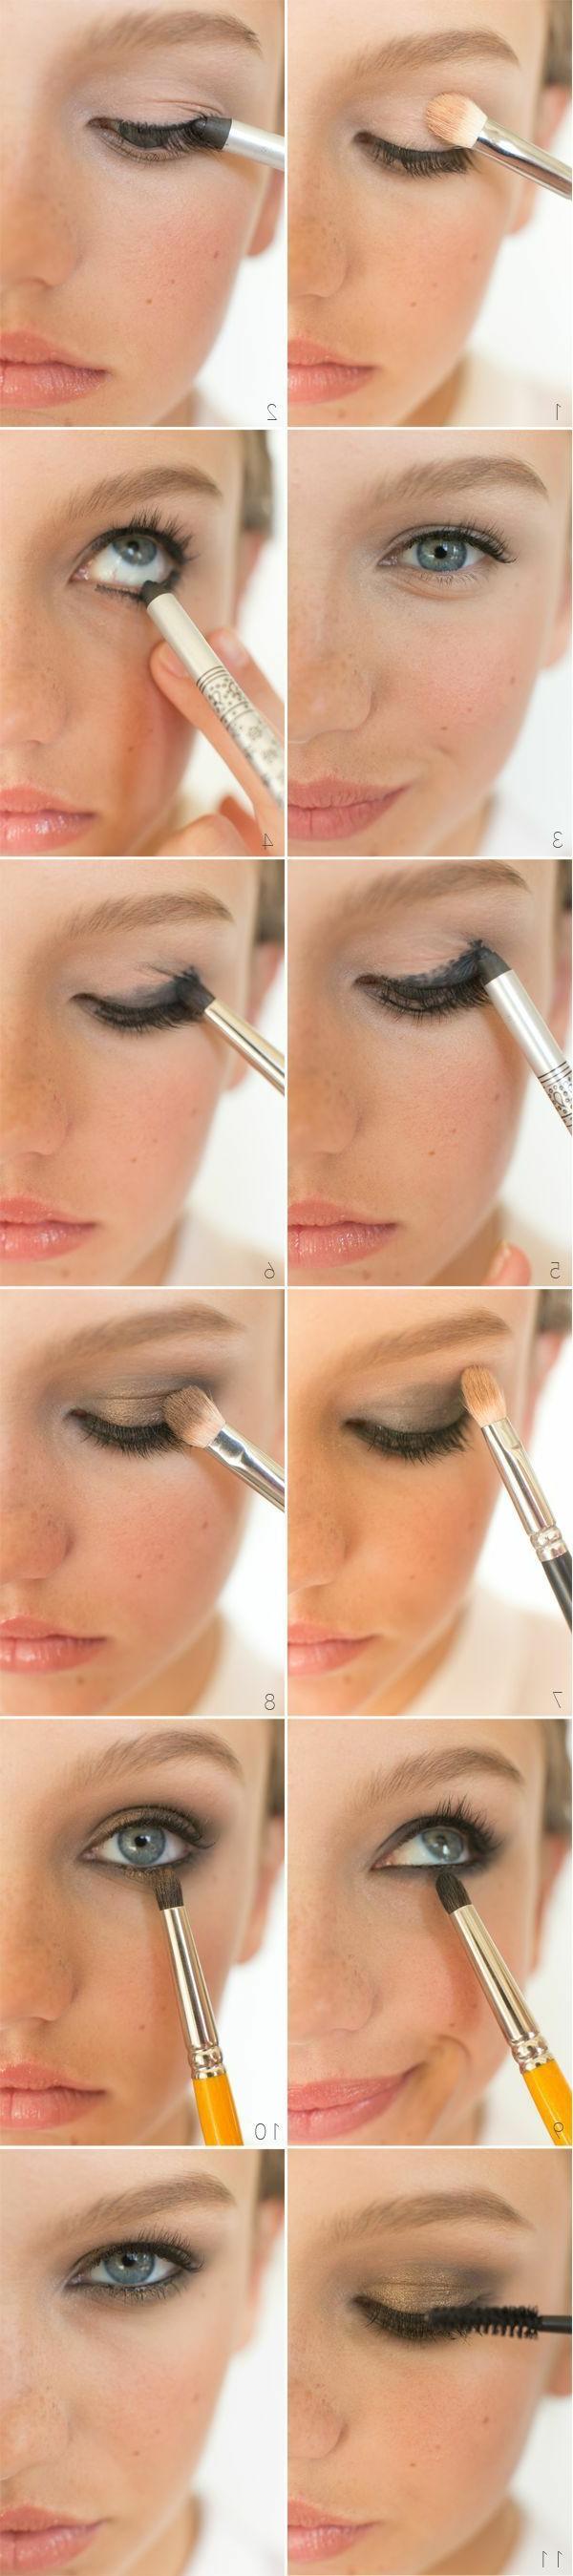 1-maquillage-des-yeux-bleus